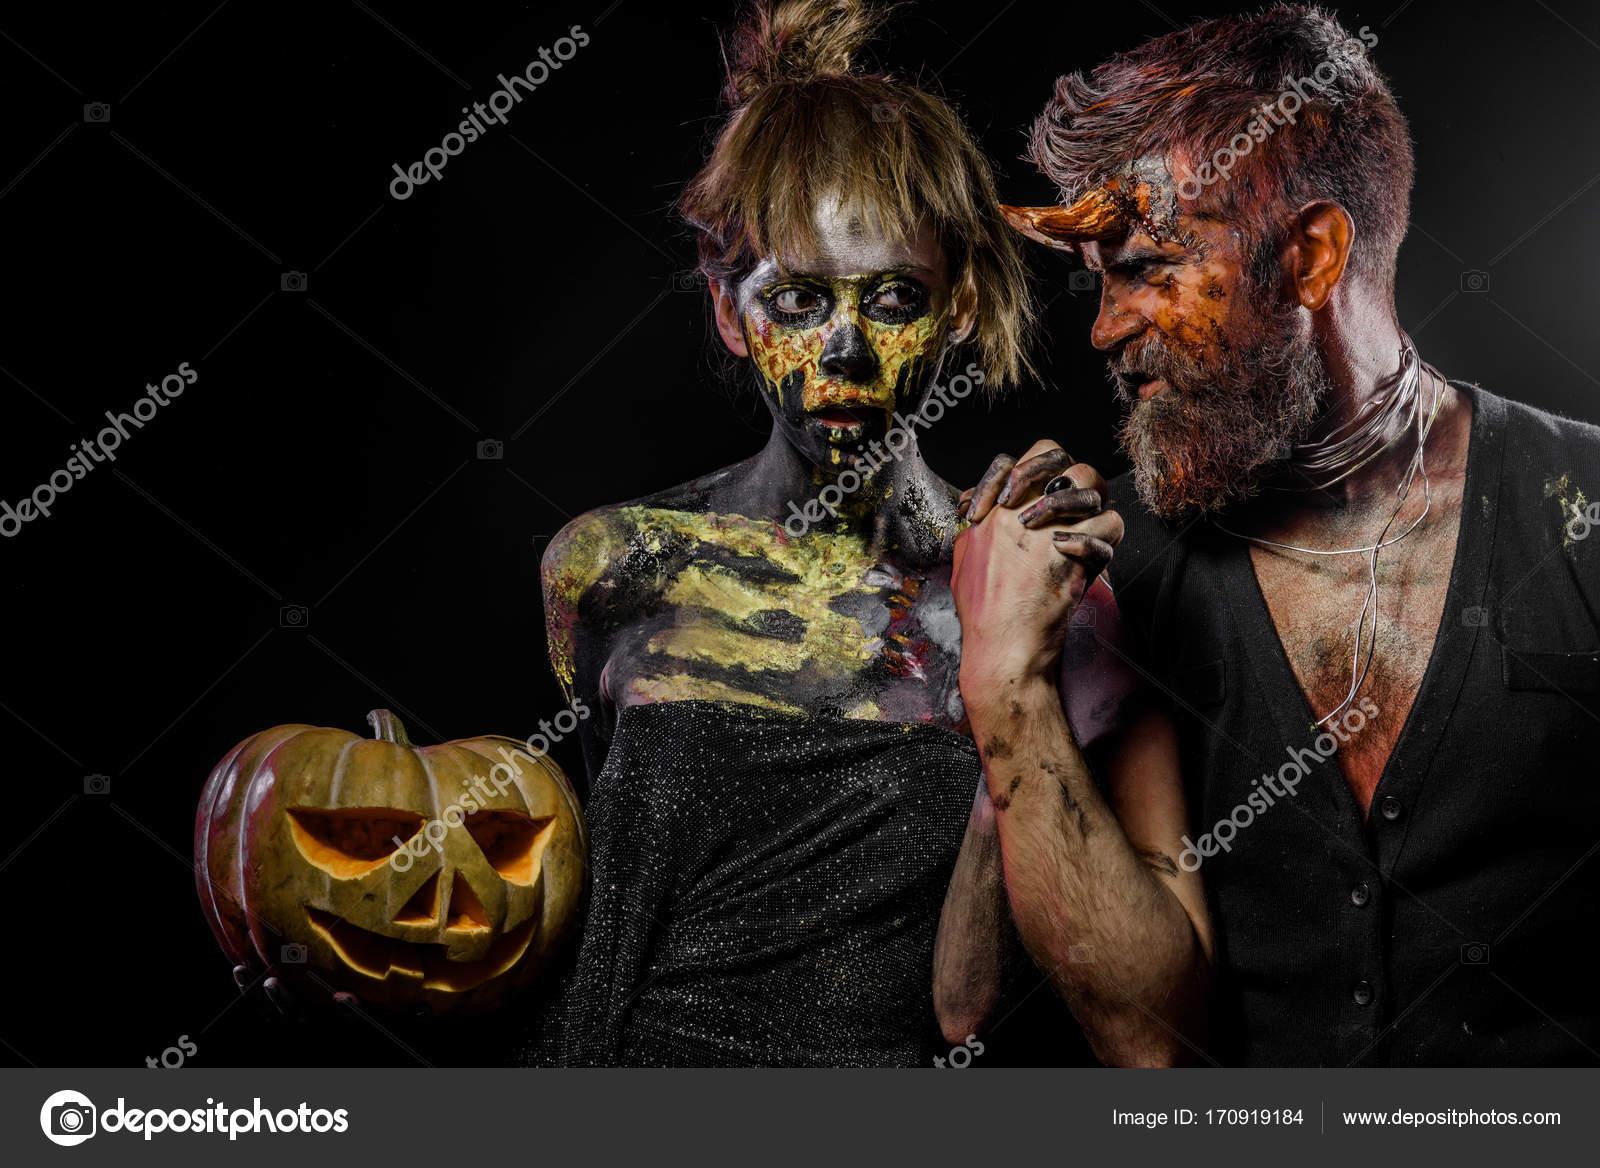 bb22ce4e1c39 Хэллоуин кошелек или жизнь концепции — Стоковое фото © Tverdohlib ...